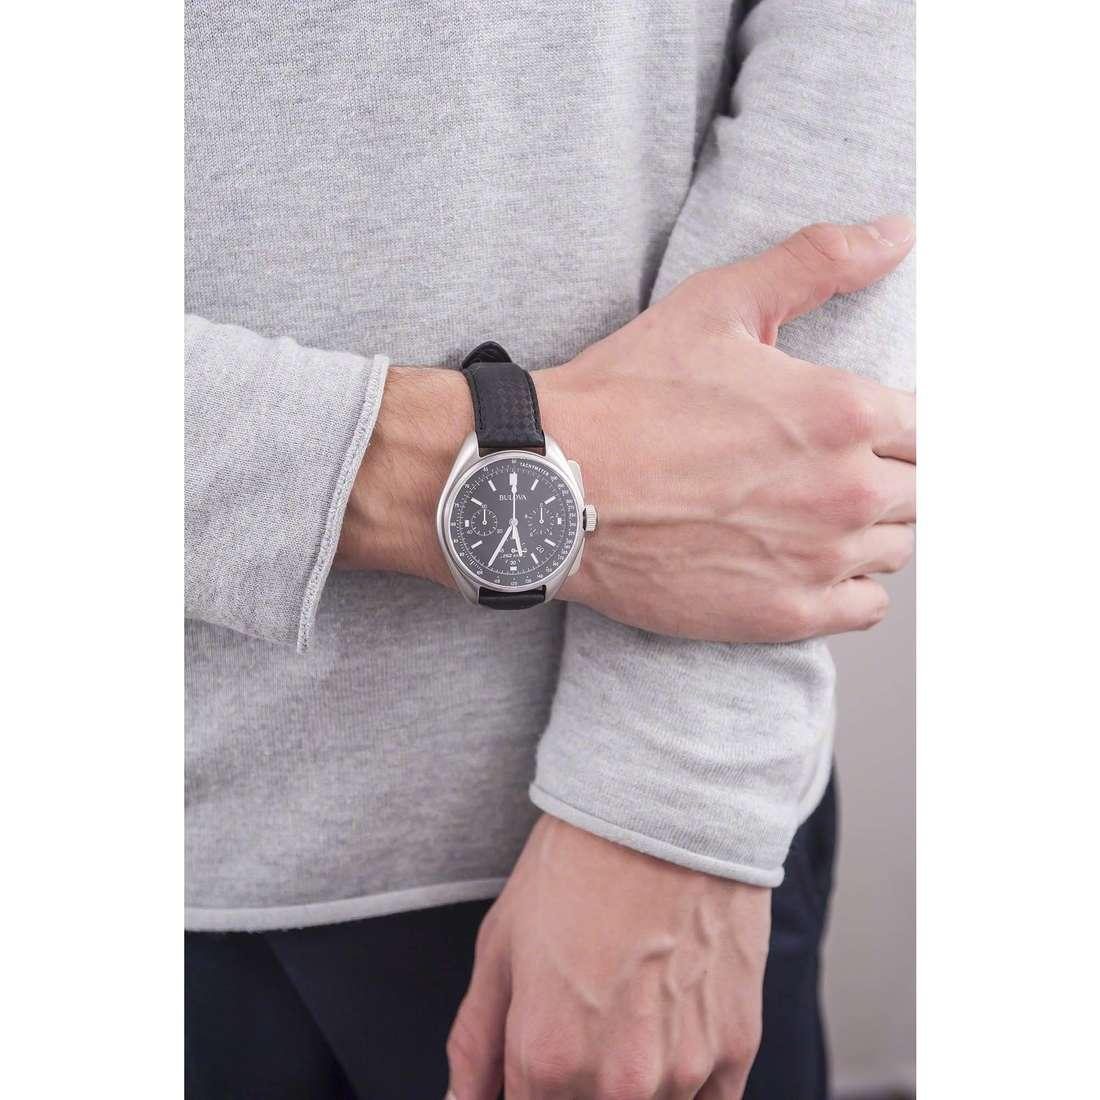 Bulova cronografi Moon Watch uomo 96B251 indosso